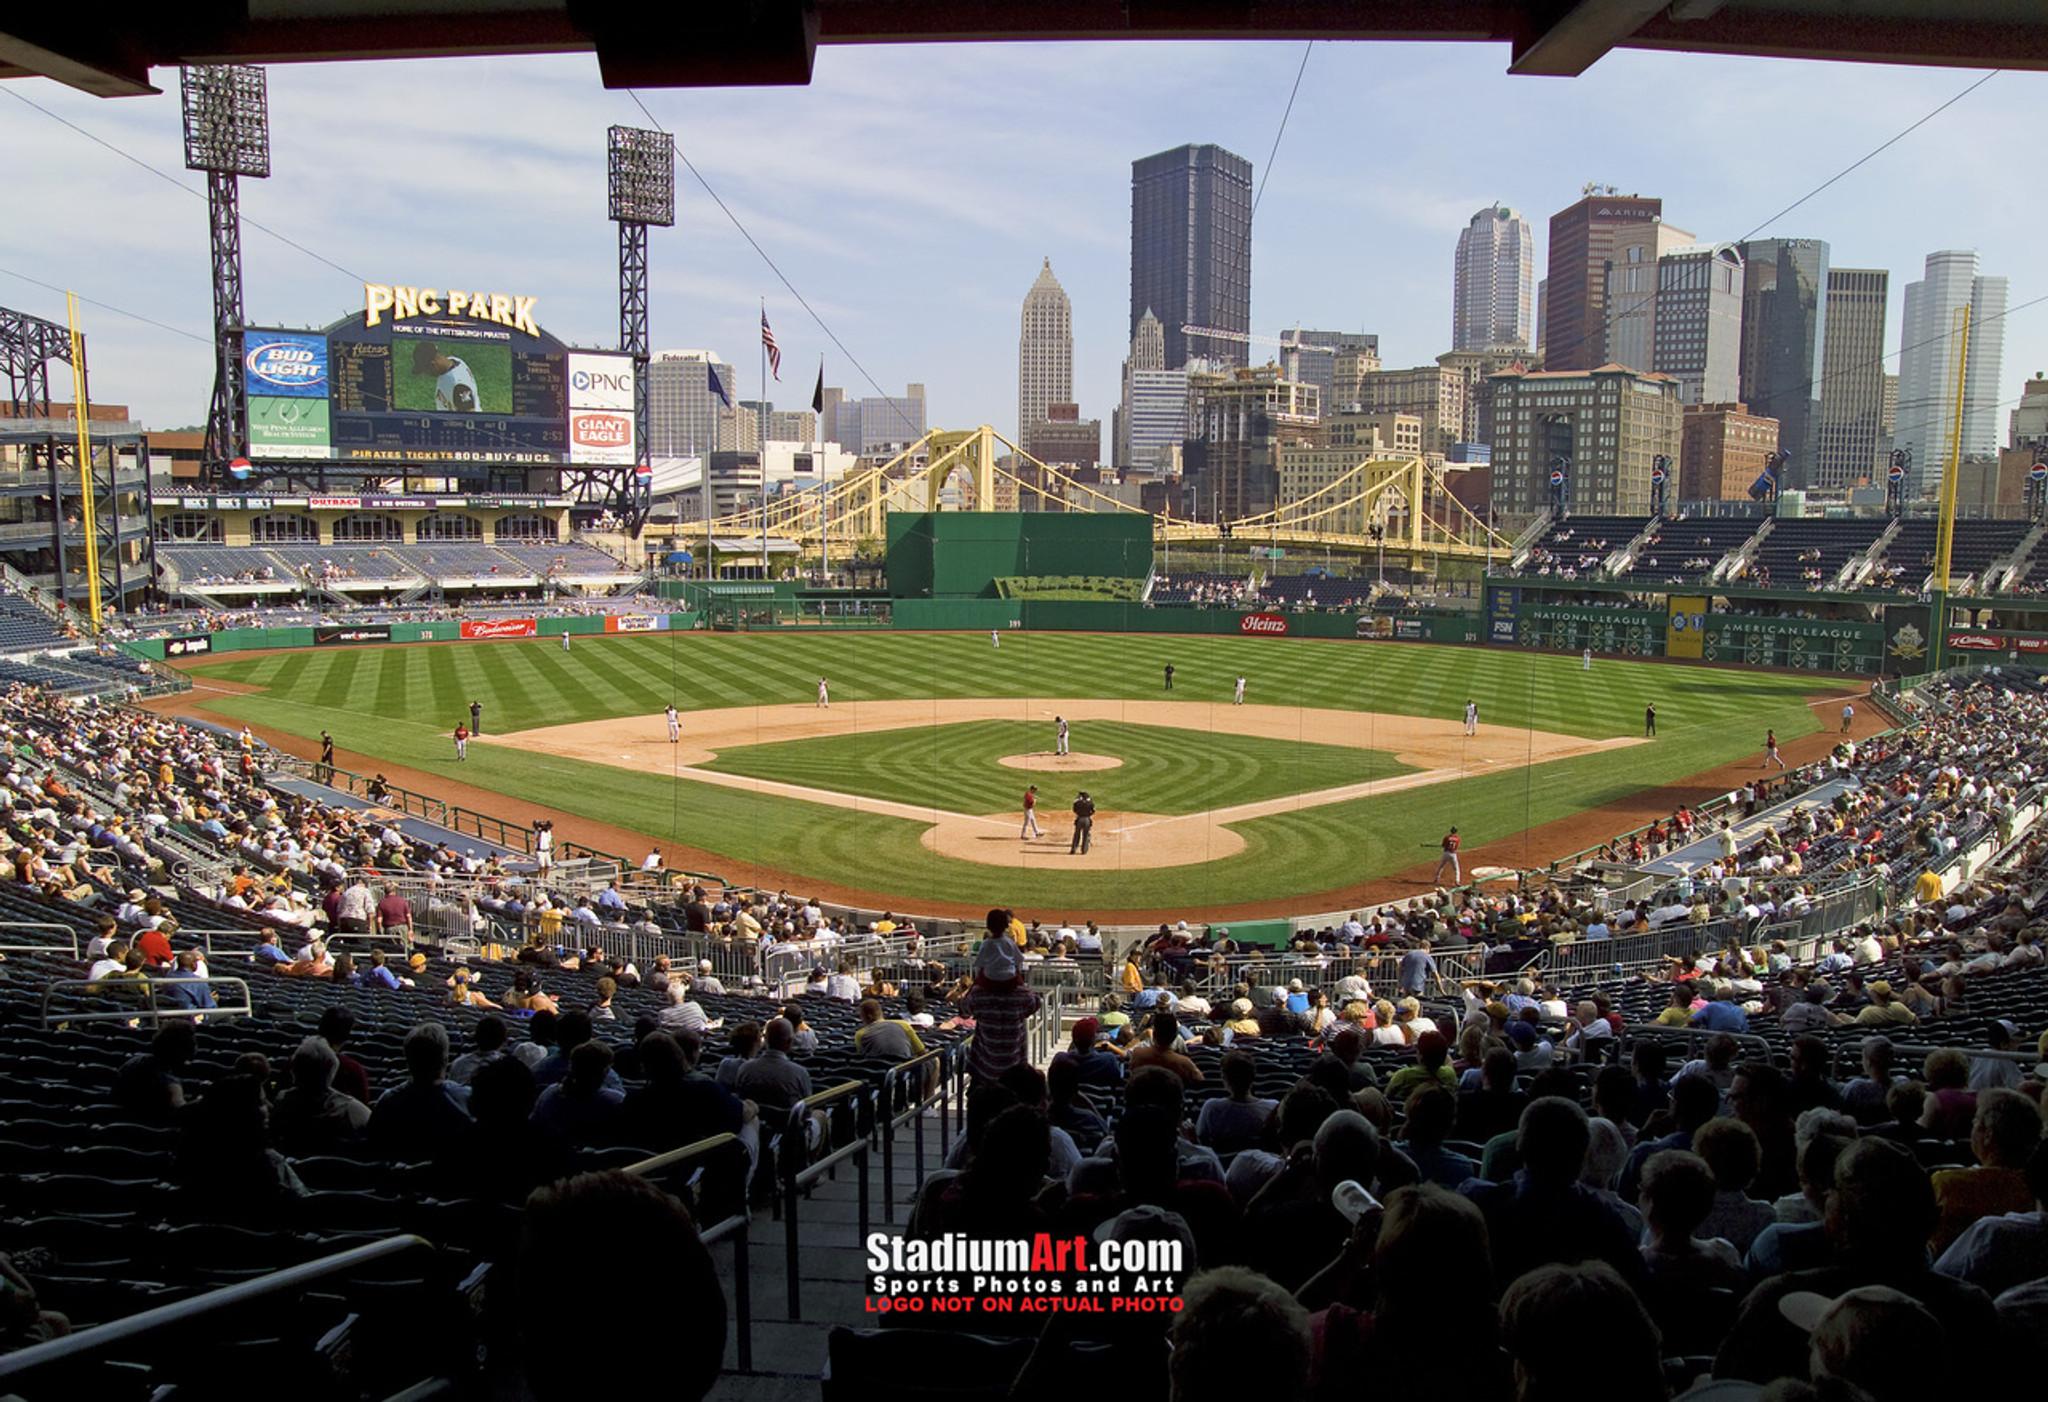 Pittsburgh Pirates Pnc Park Baseball Stadium 8x10 To 48x36 Photo 10